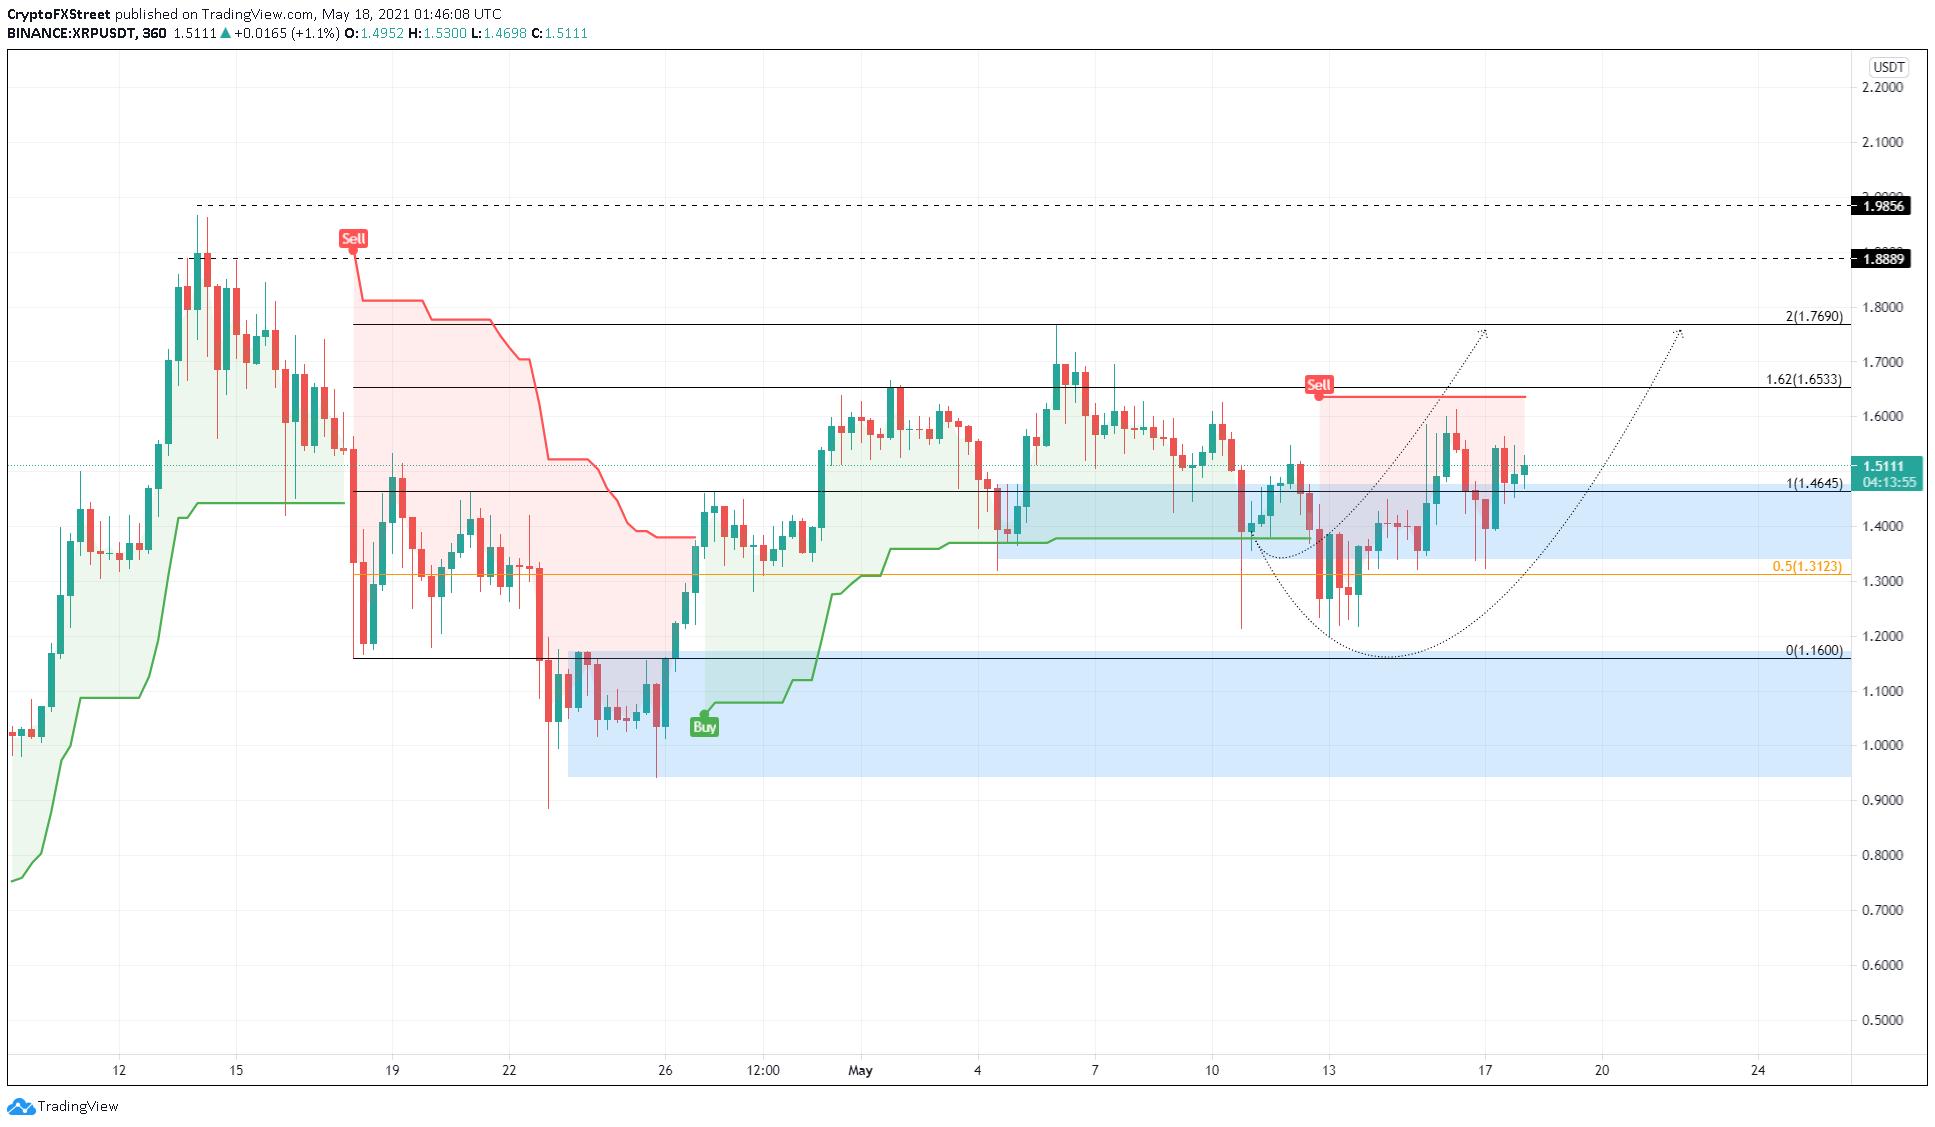 XRP/USDT 6-hour chart